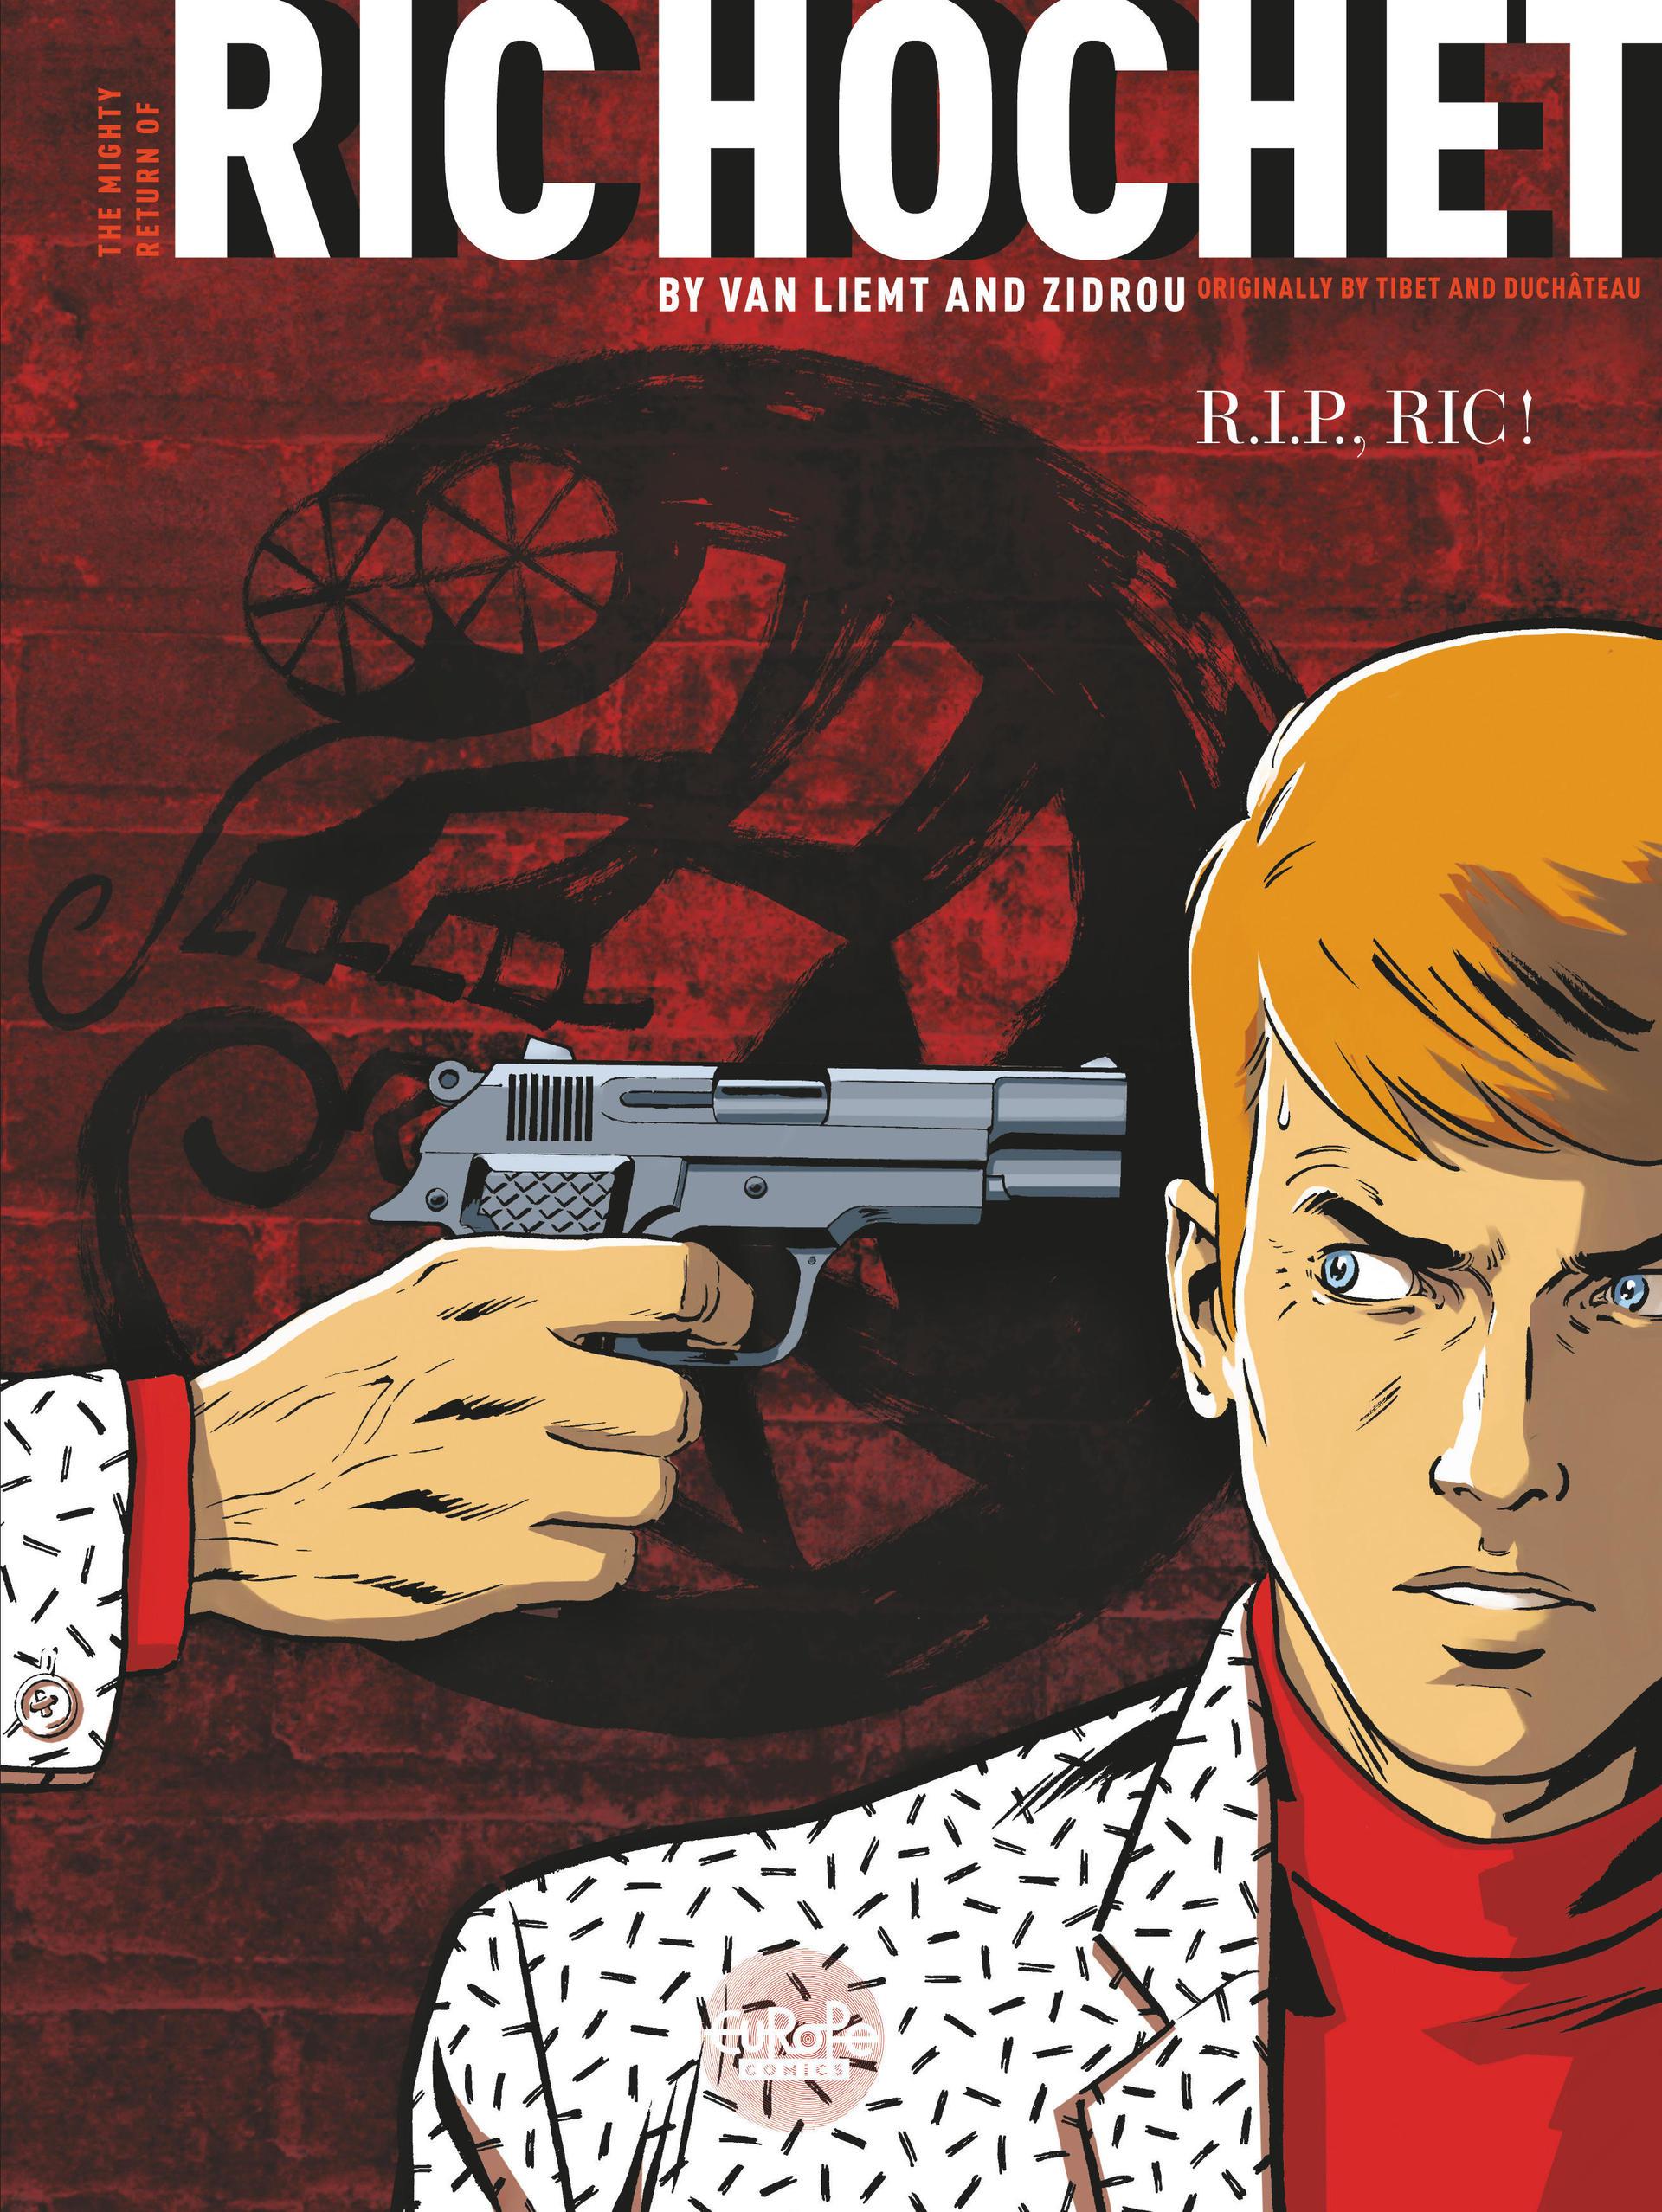 Ric Hochet - Volume 1 -  R.I.P., Ric!